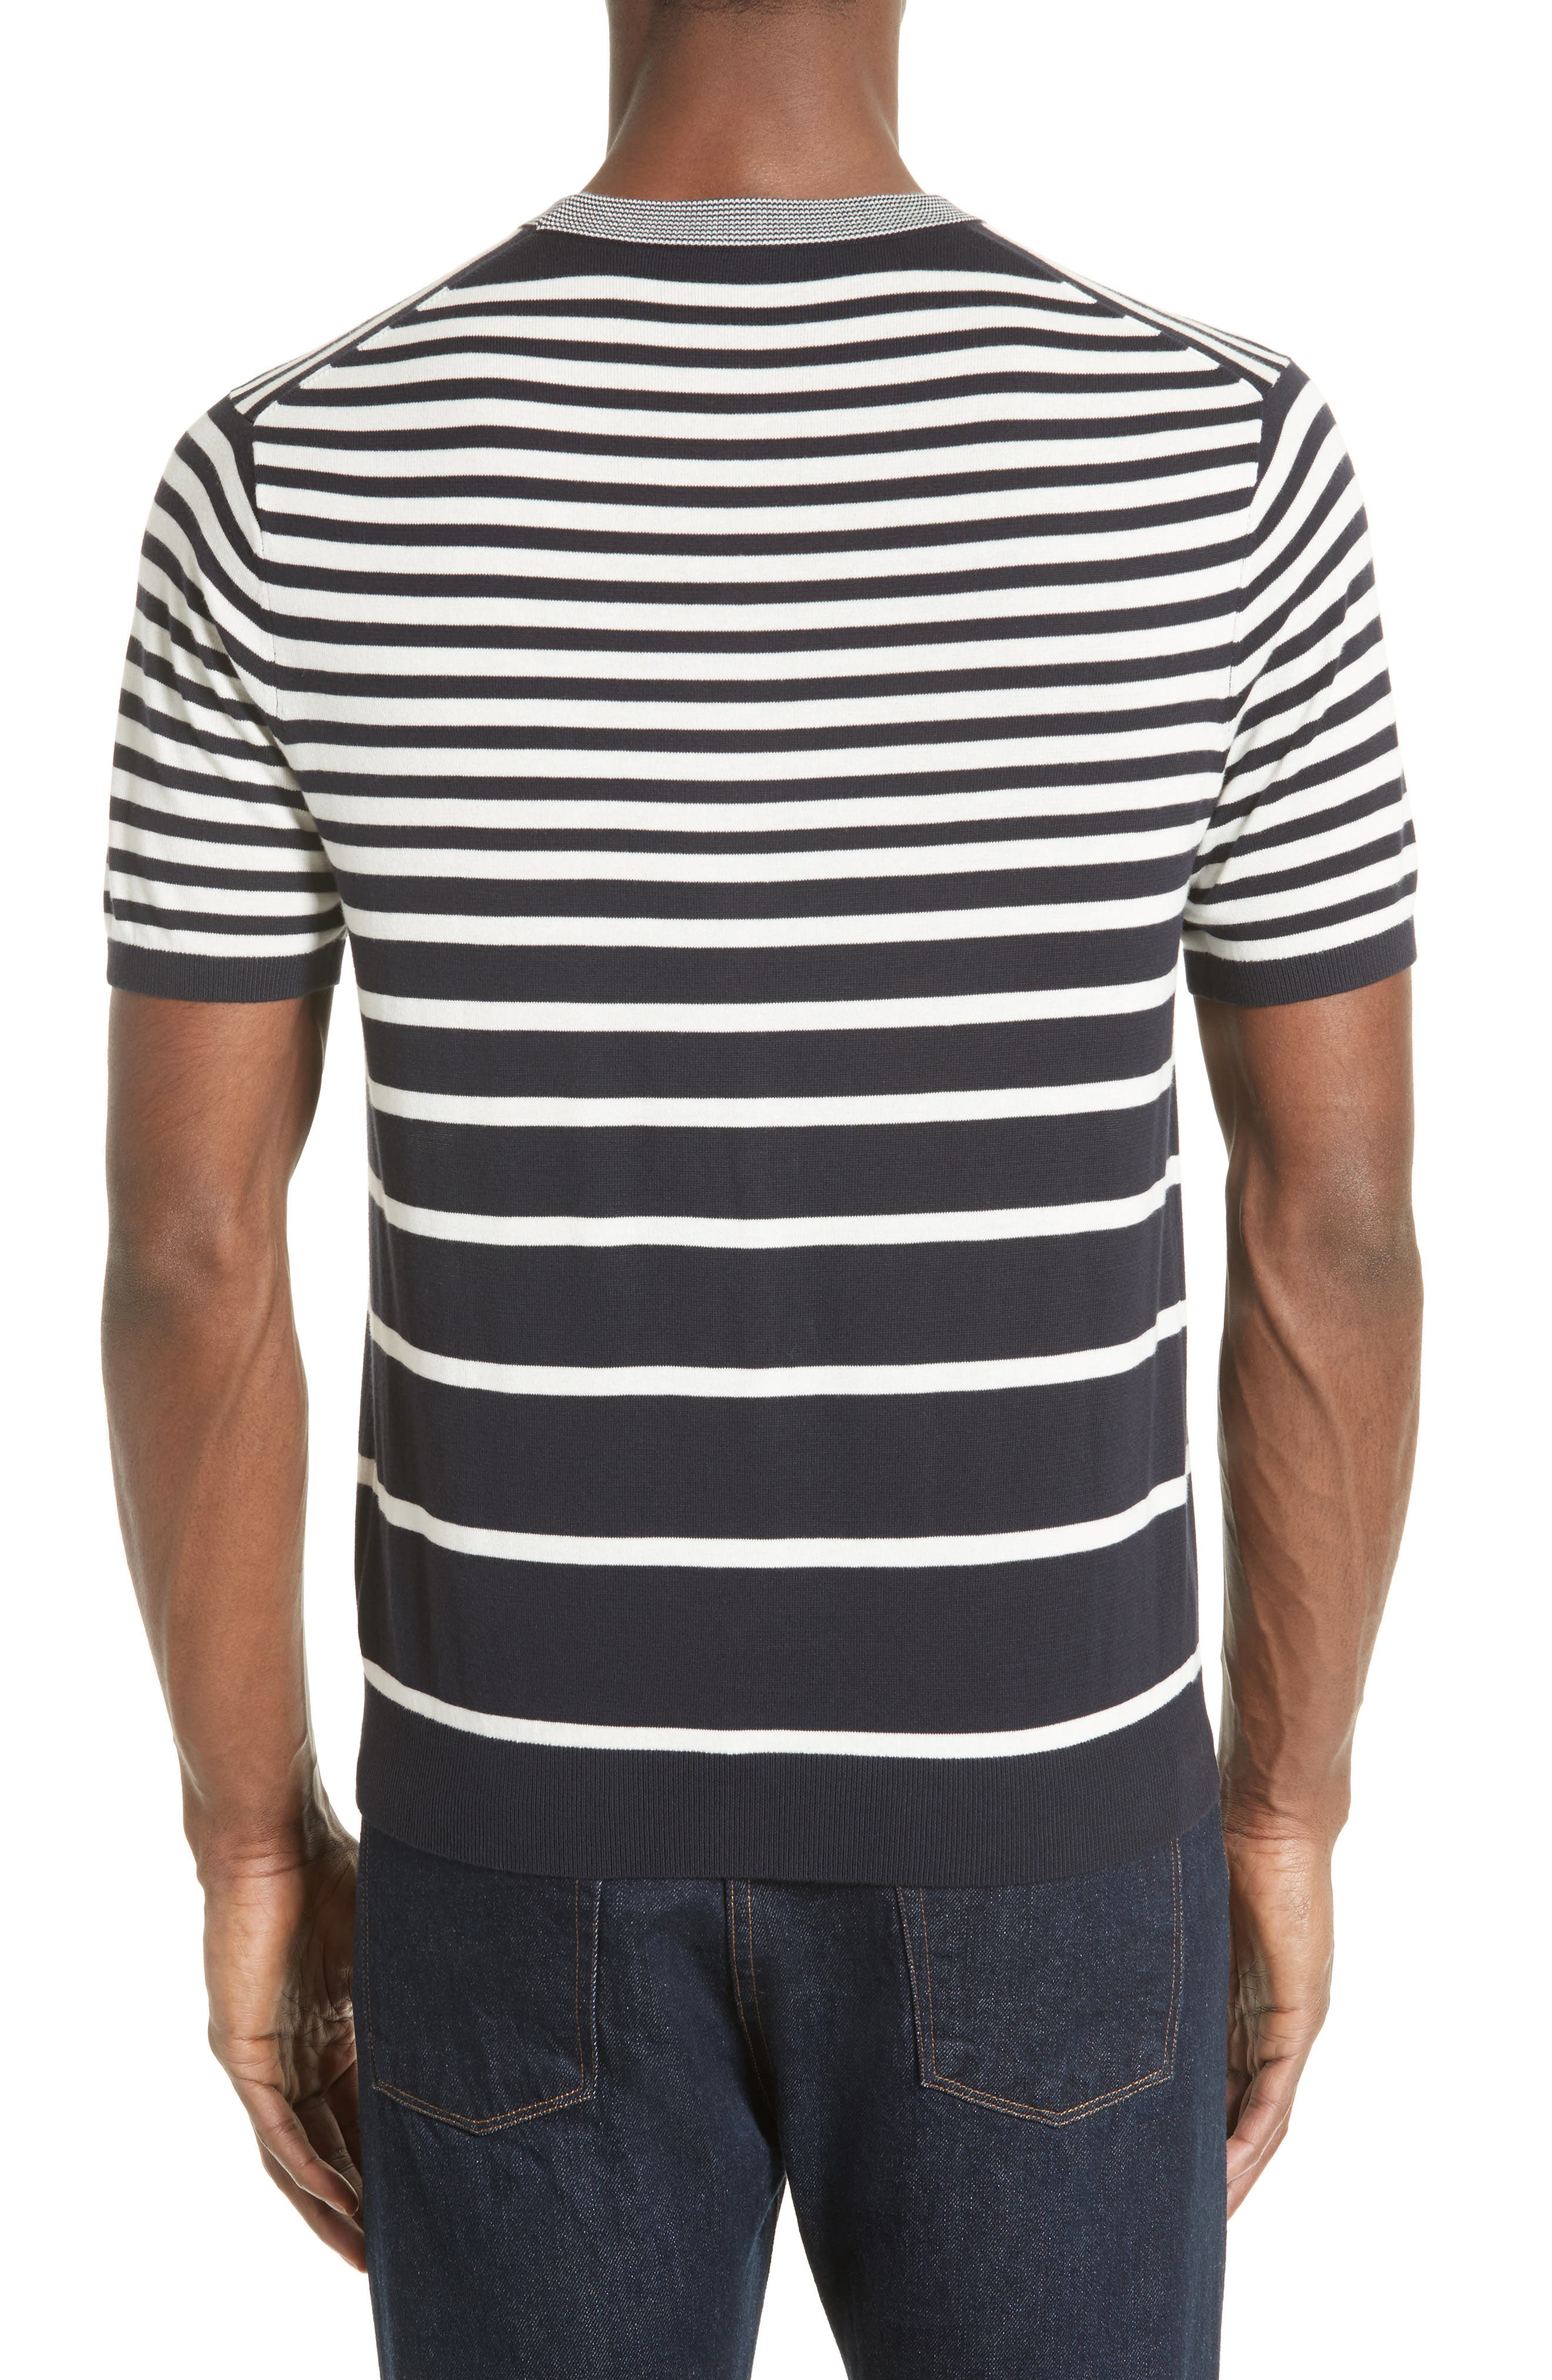 Variegated Stripe Sweater,                             Alternate thumbnail 2, color,                             410